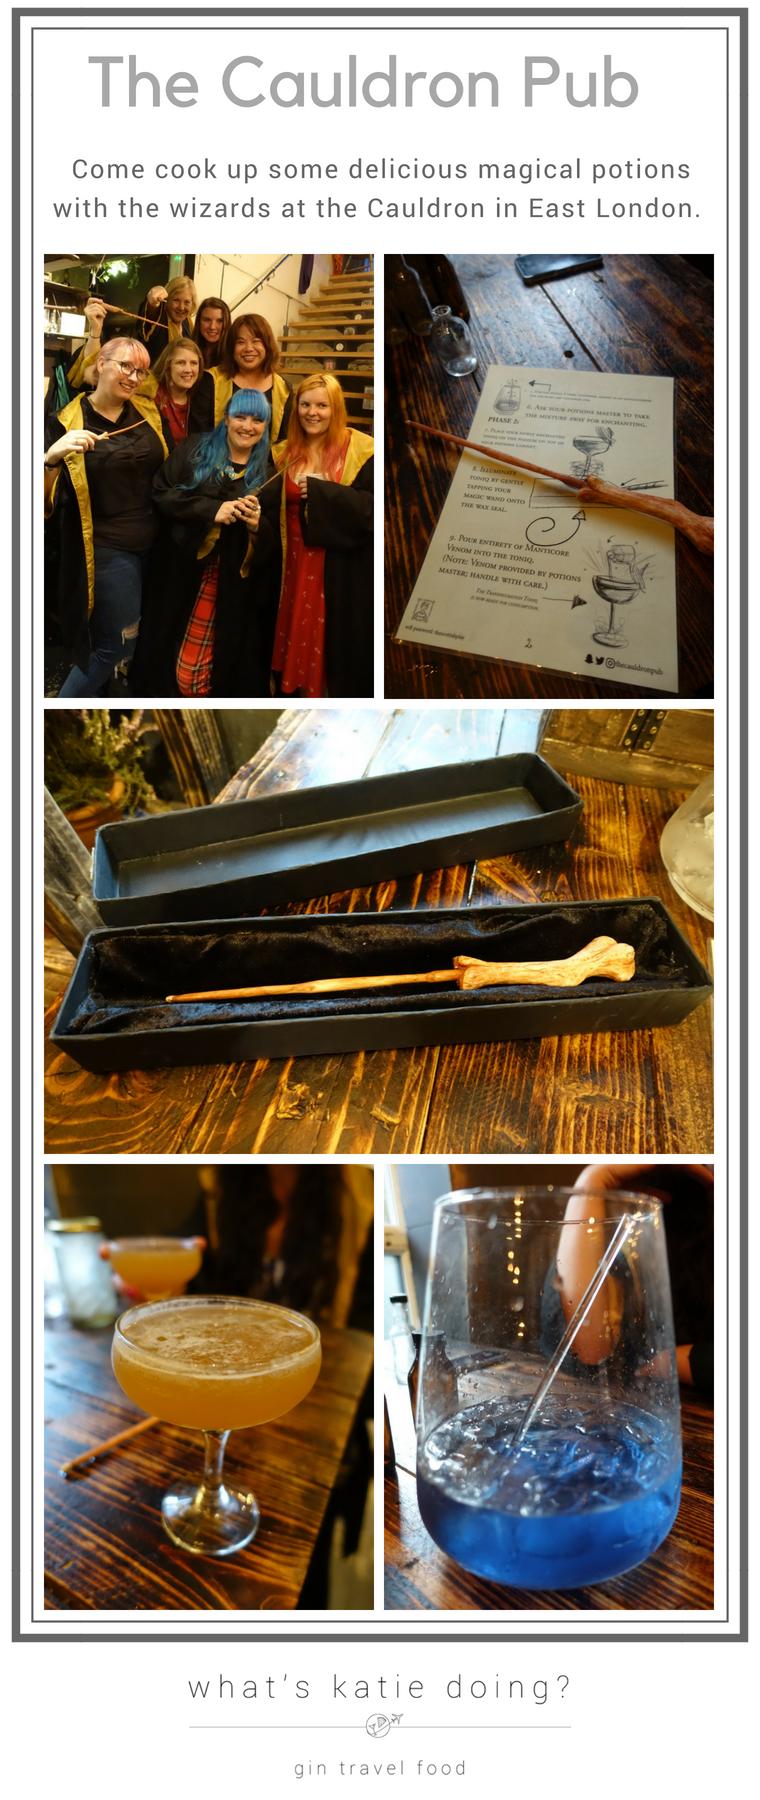 The Cauldron Pub magical potion making